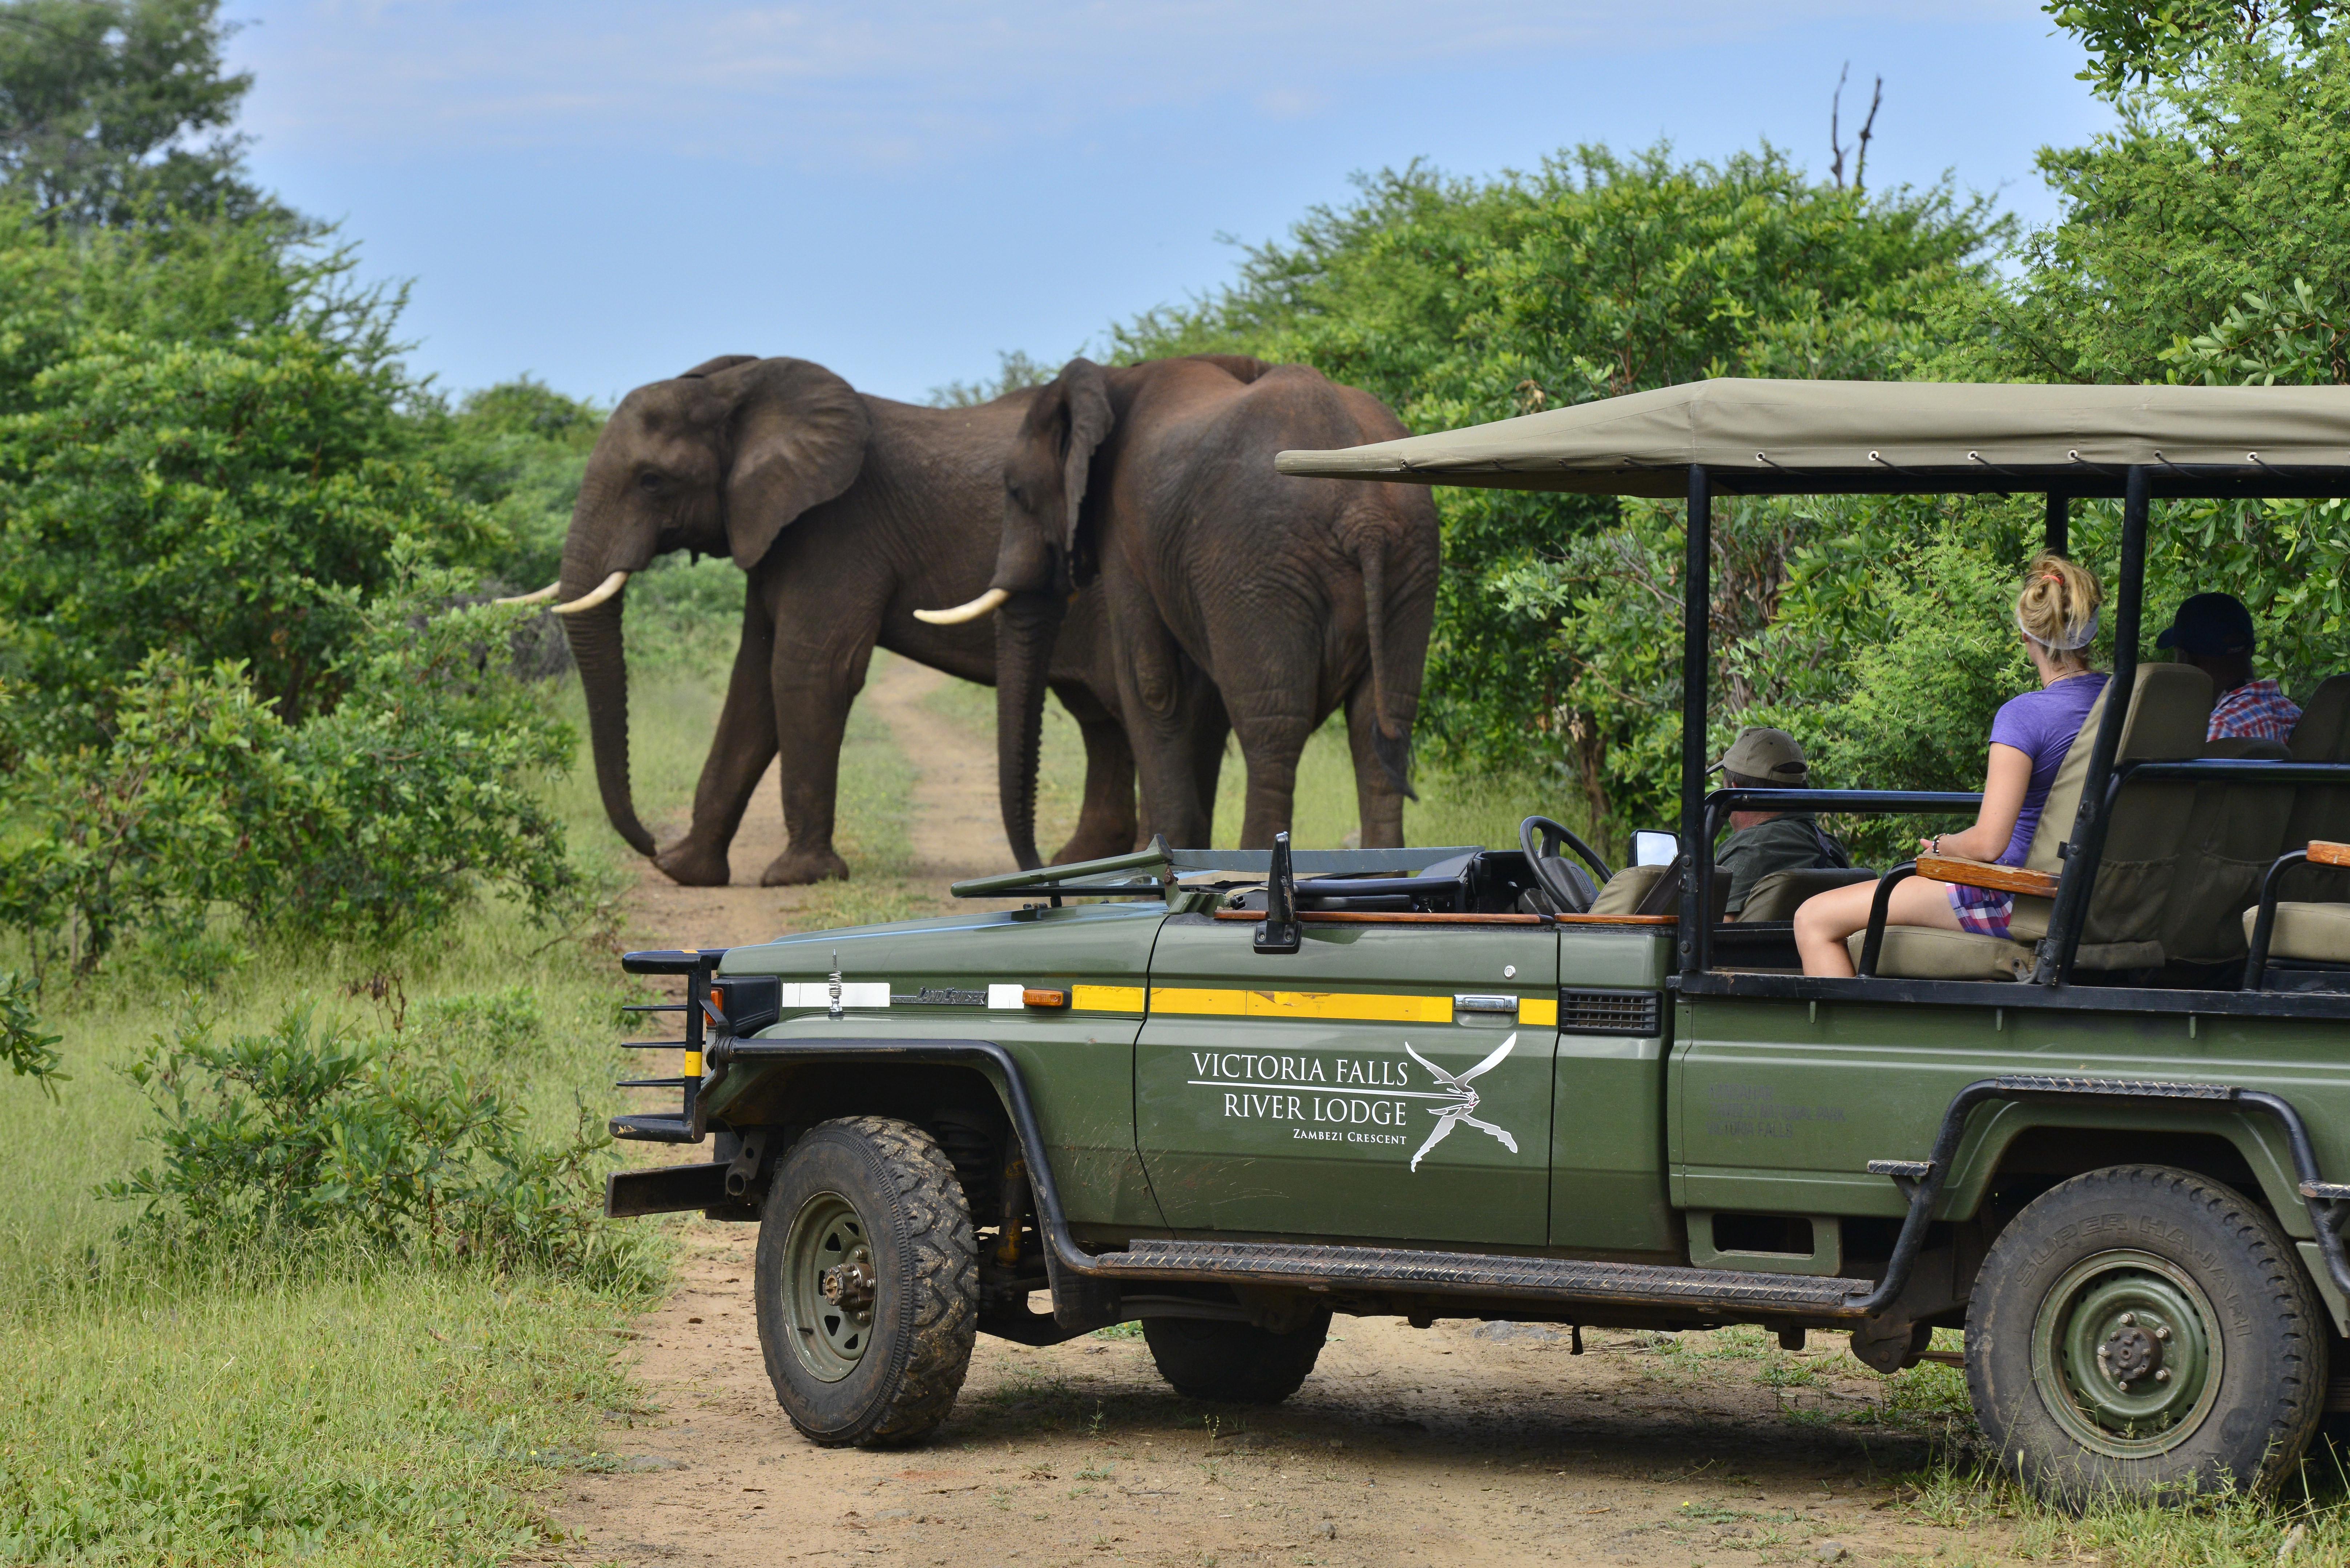 Safari der Victoria Falls River Lodge